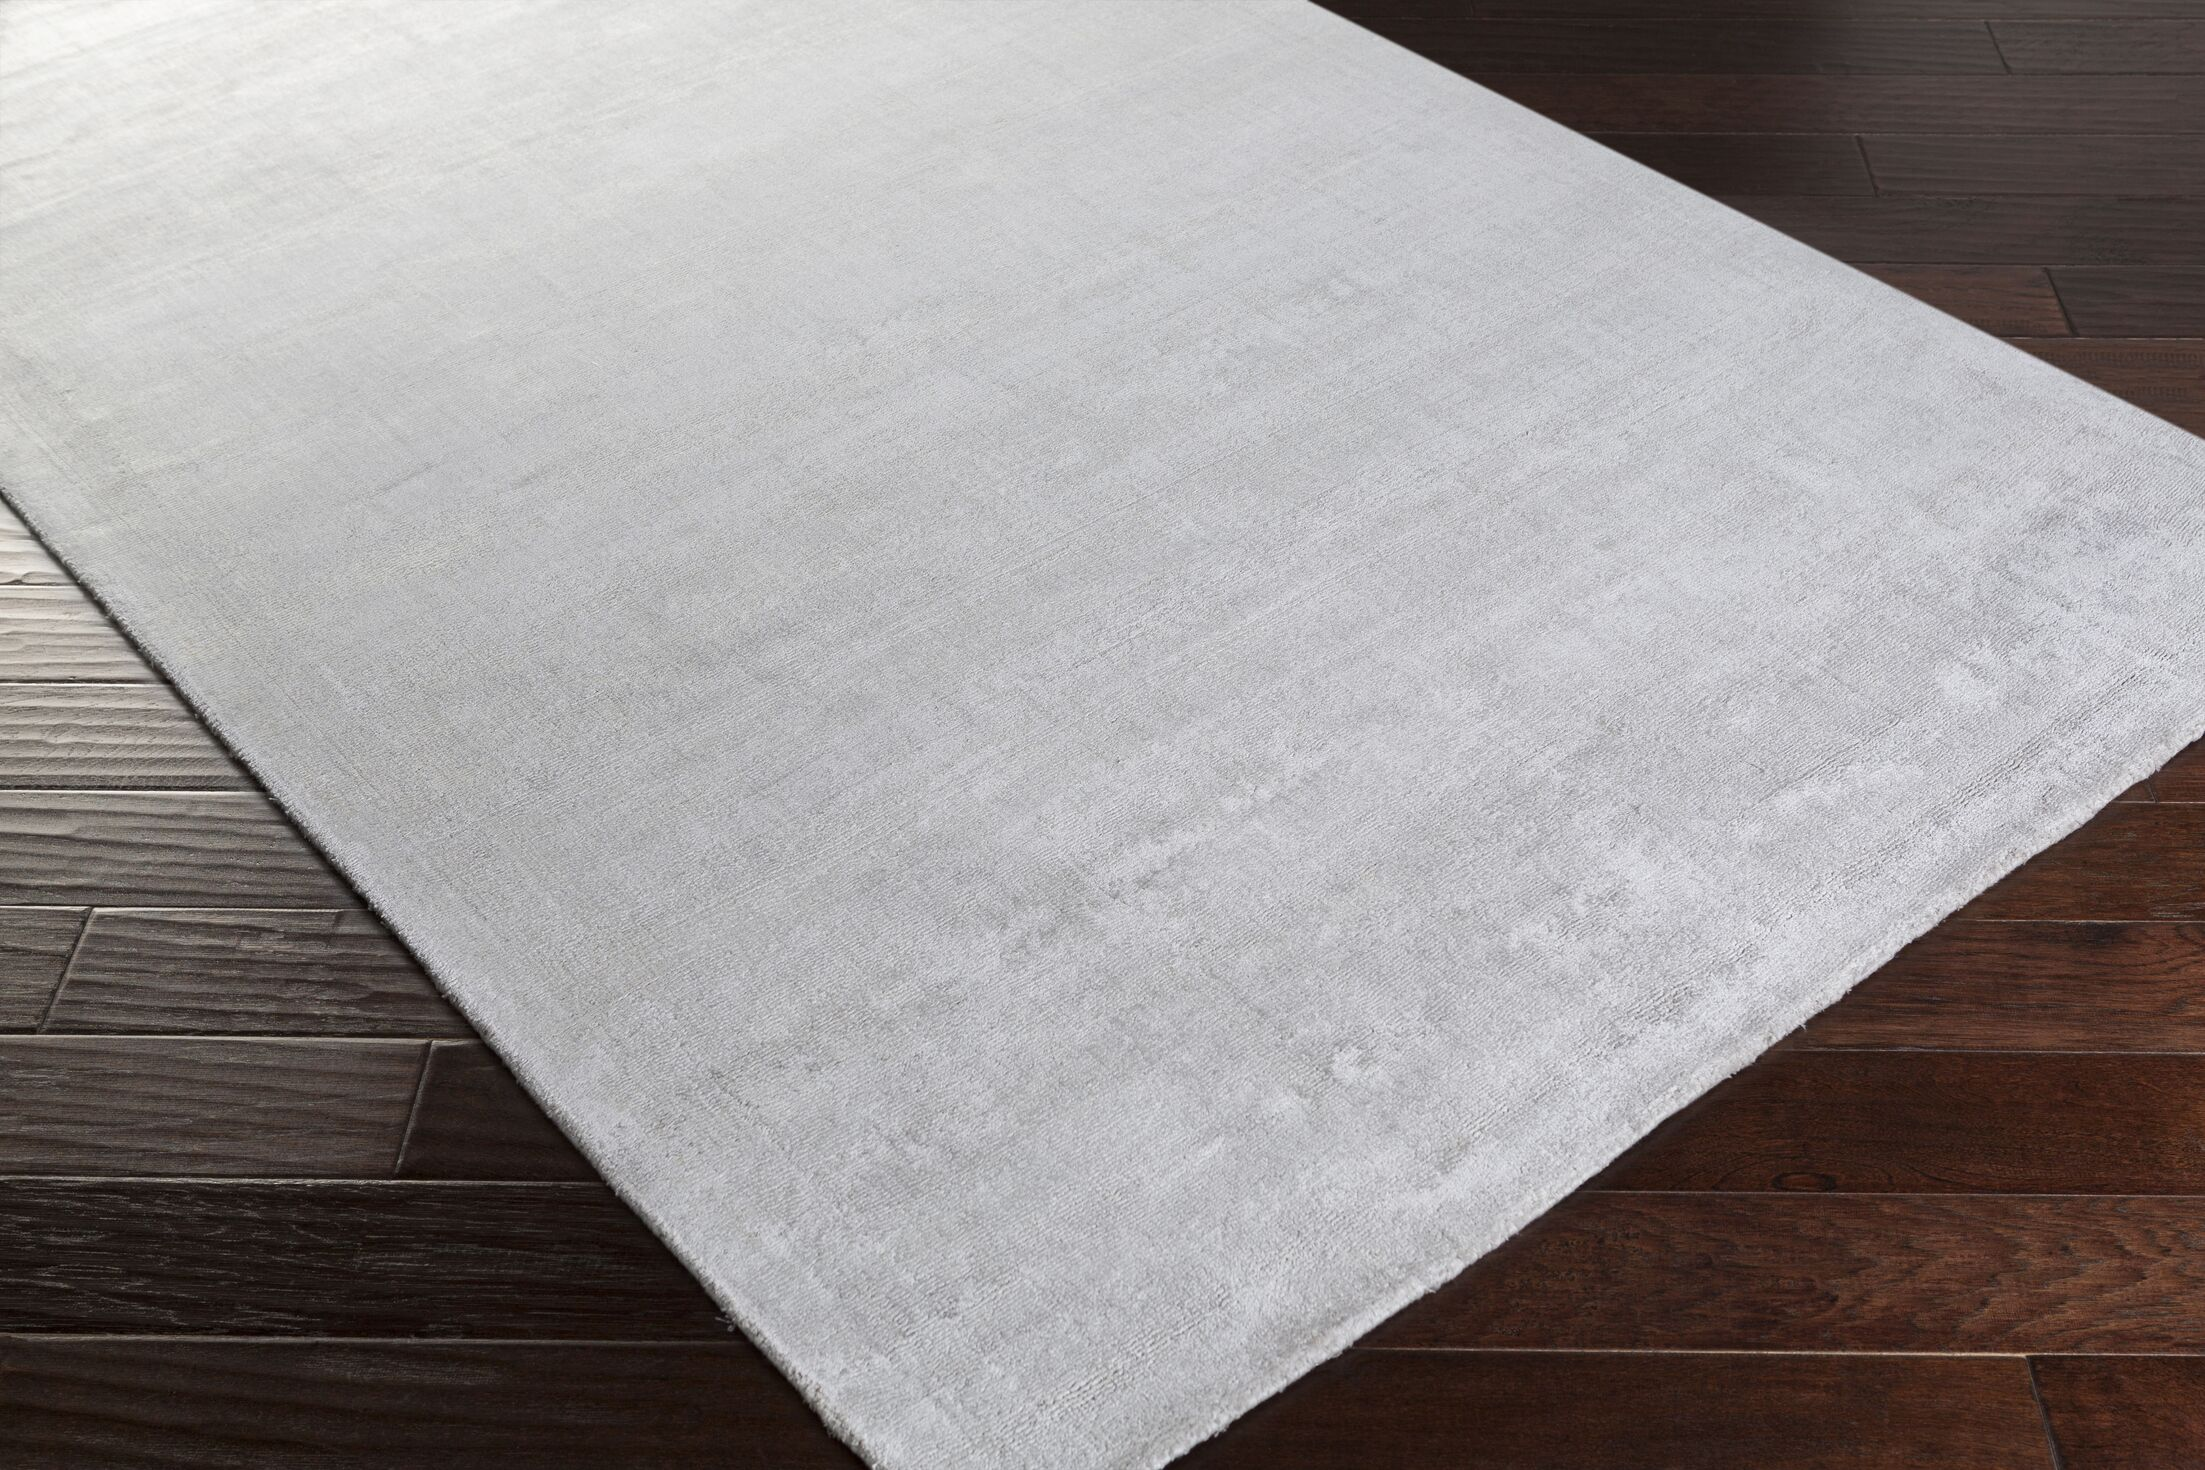 Mcspadden Gray Area Rug Rug Size: Rectangle 2' x 3'